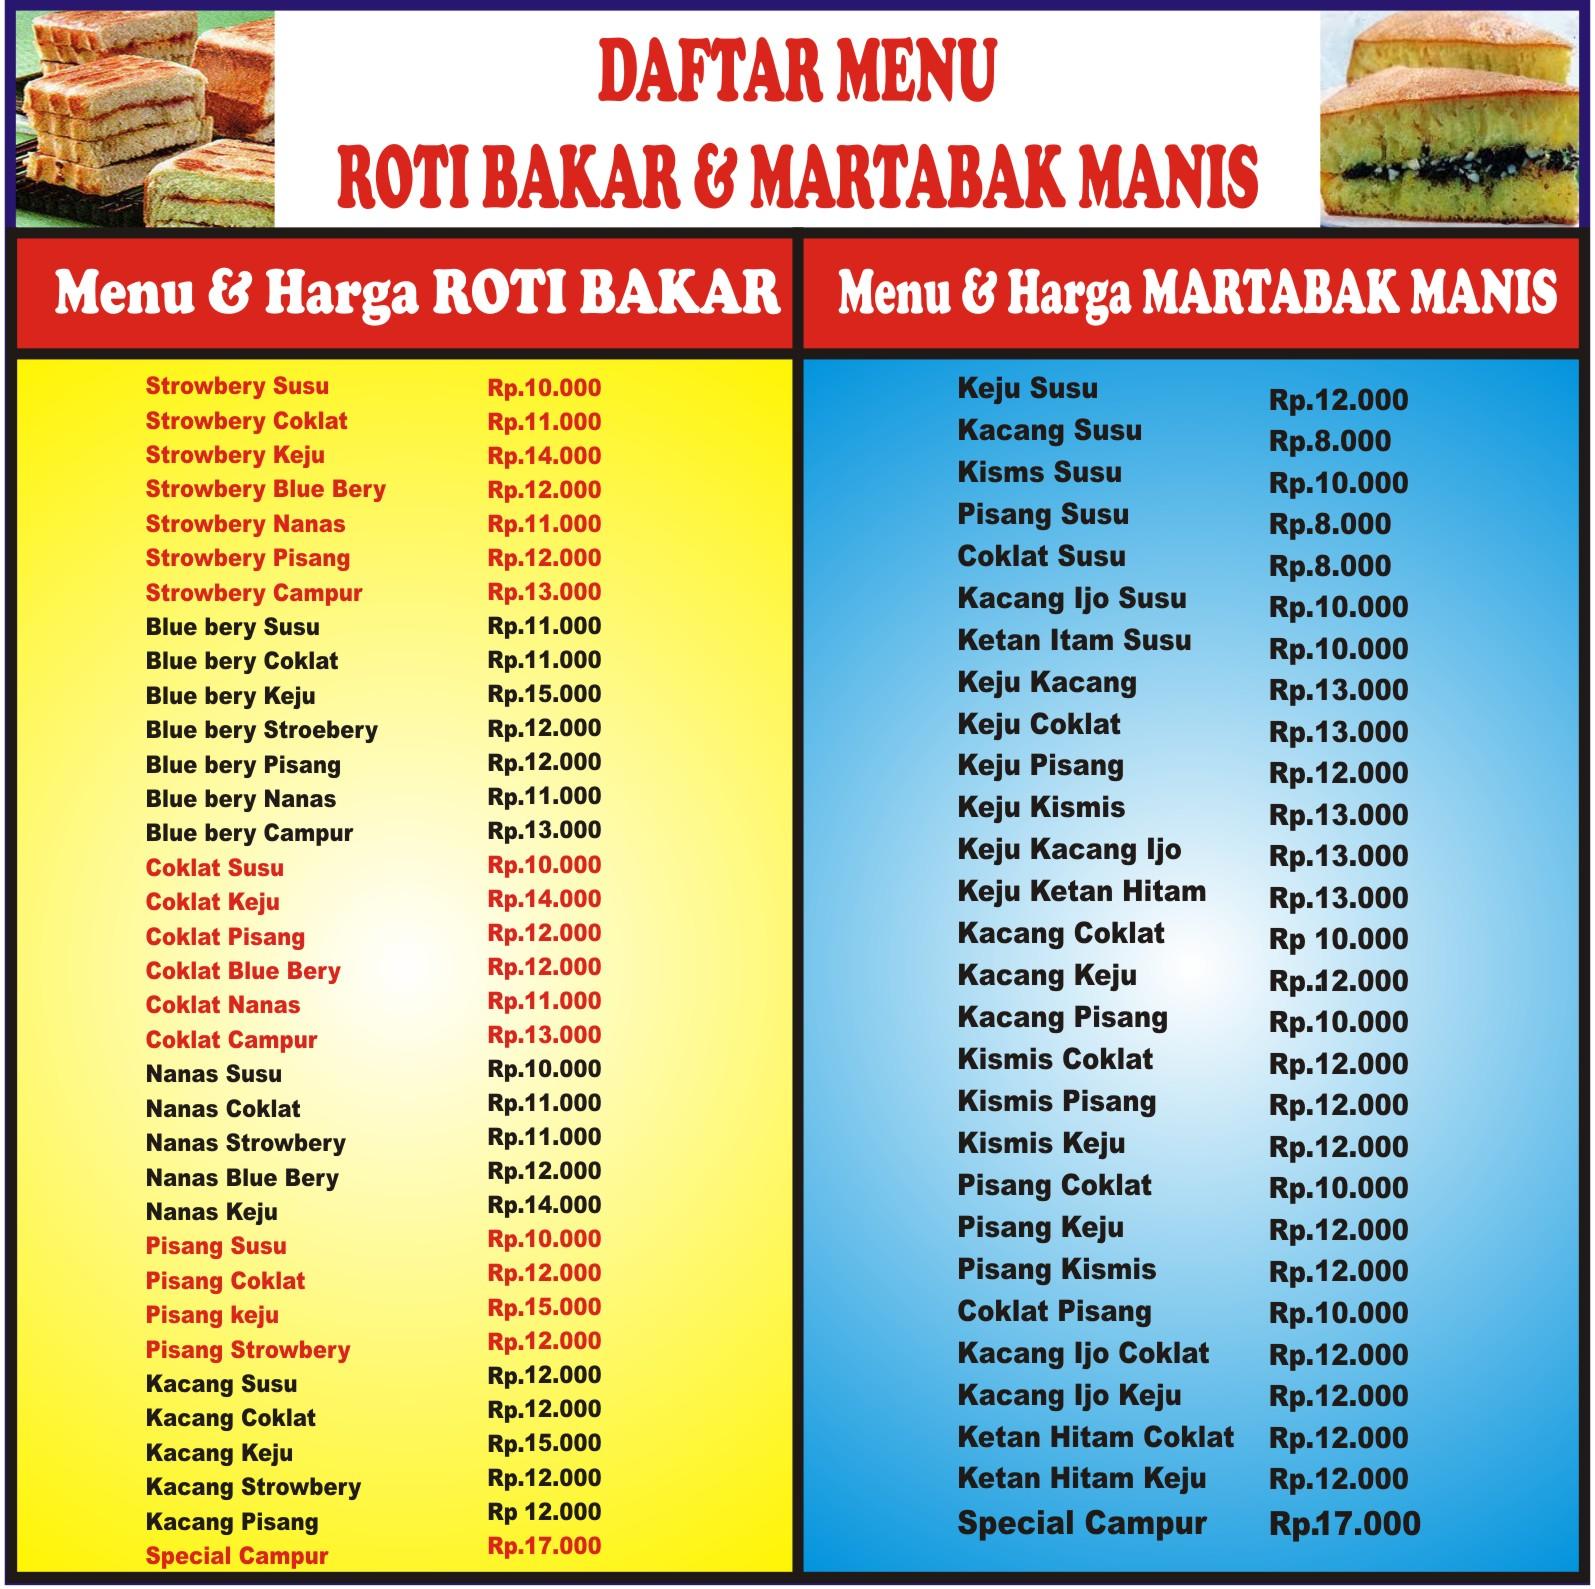 Contoh Daftar Menu Martabak.cdr